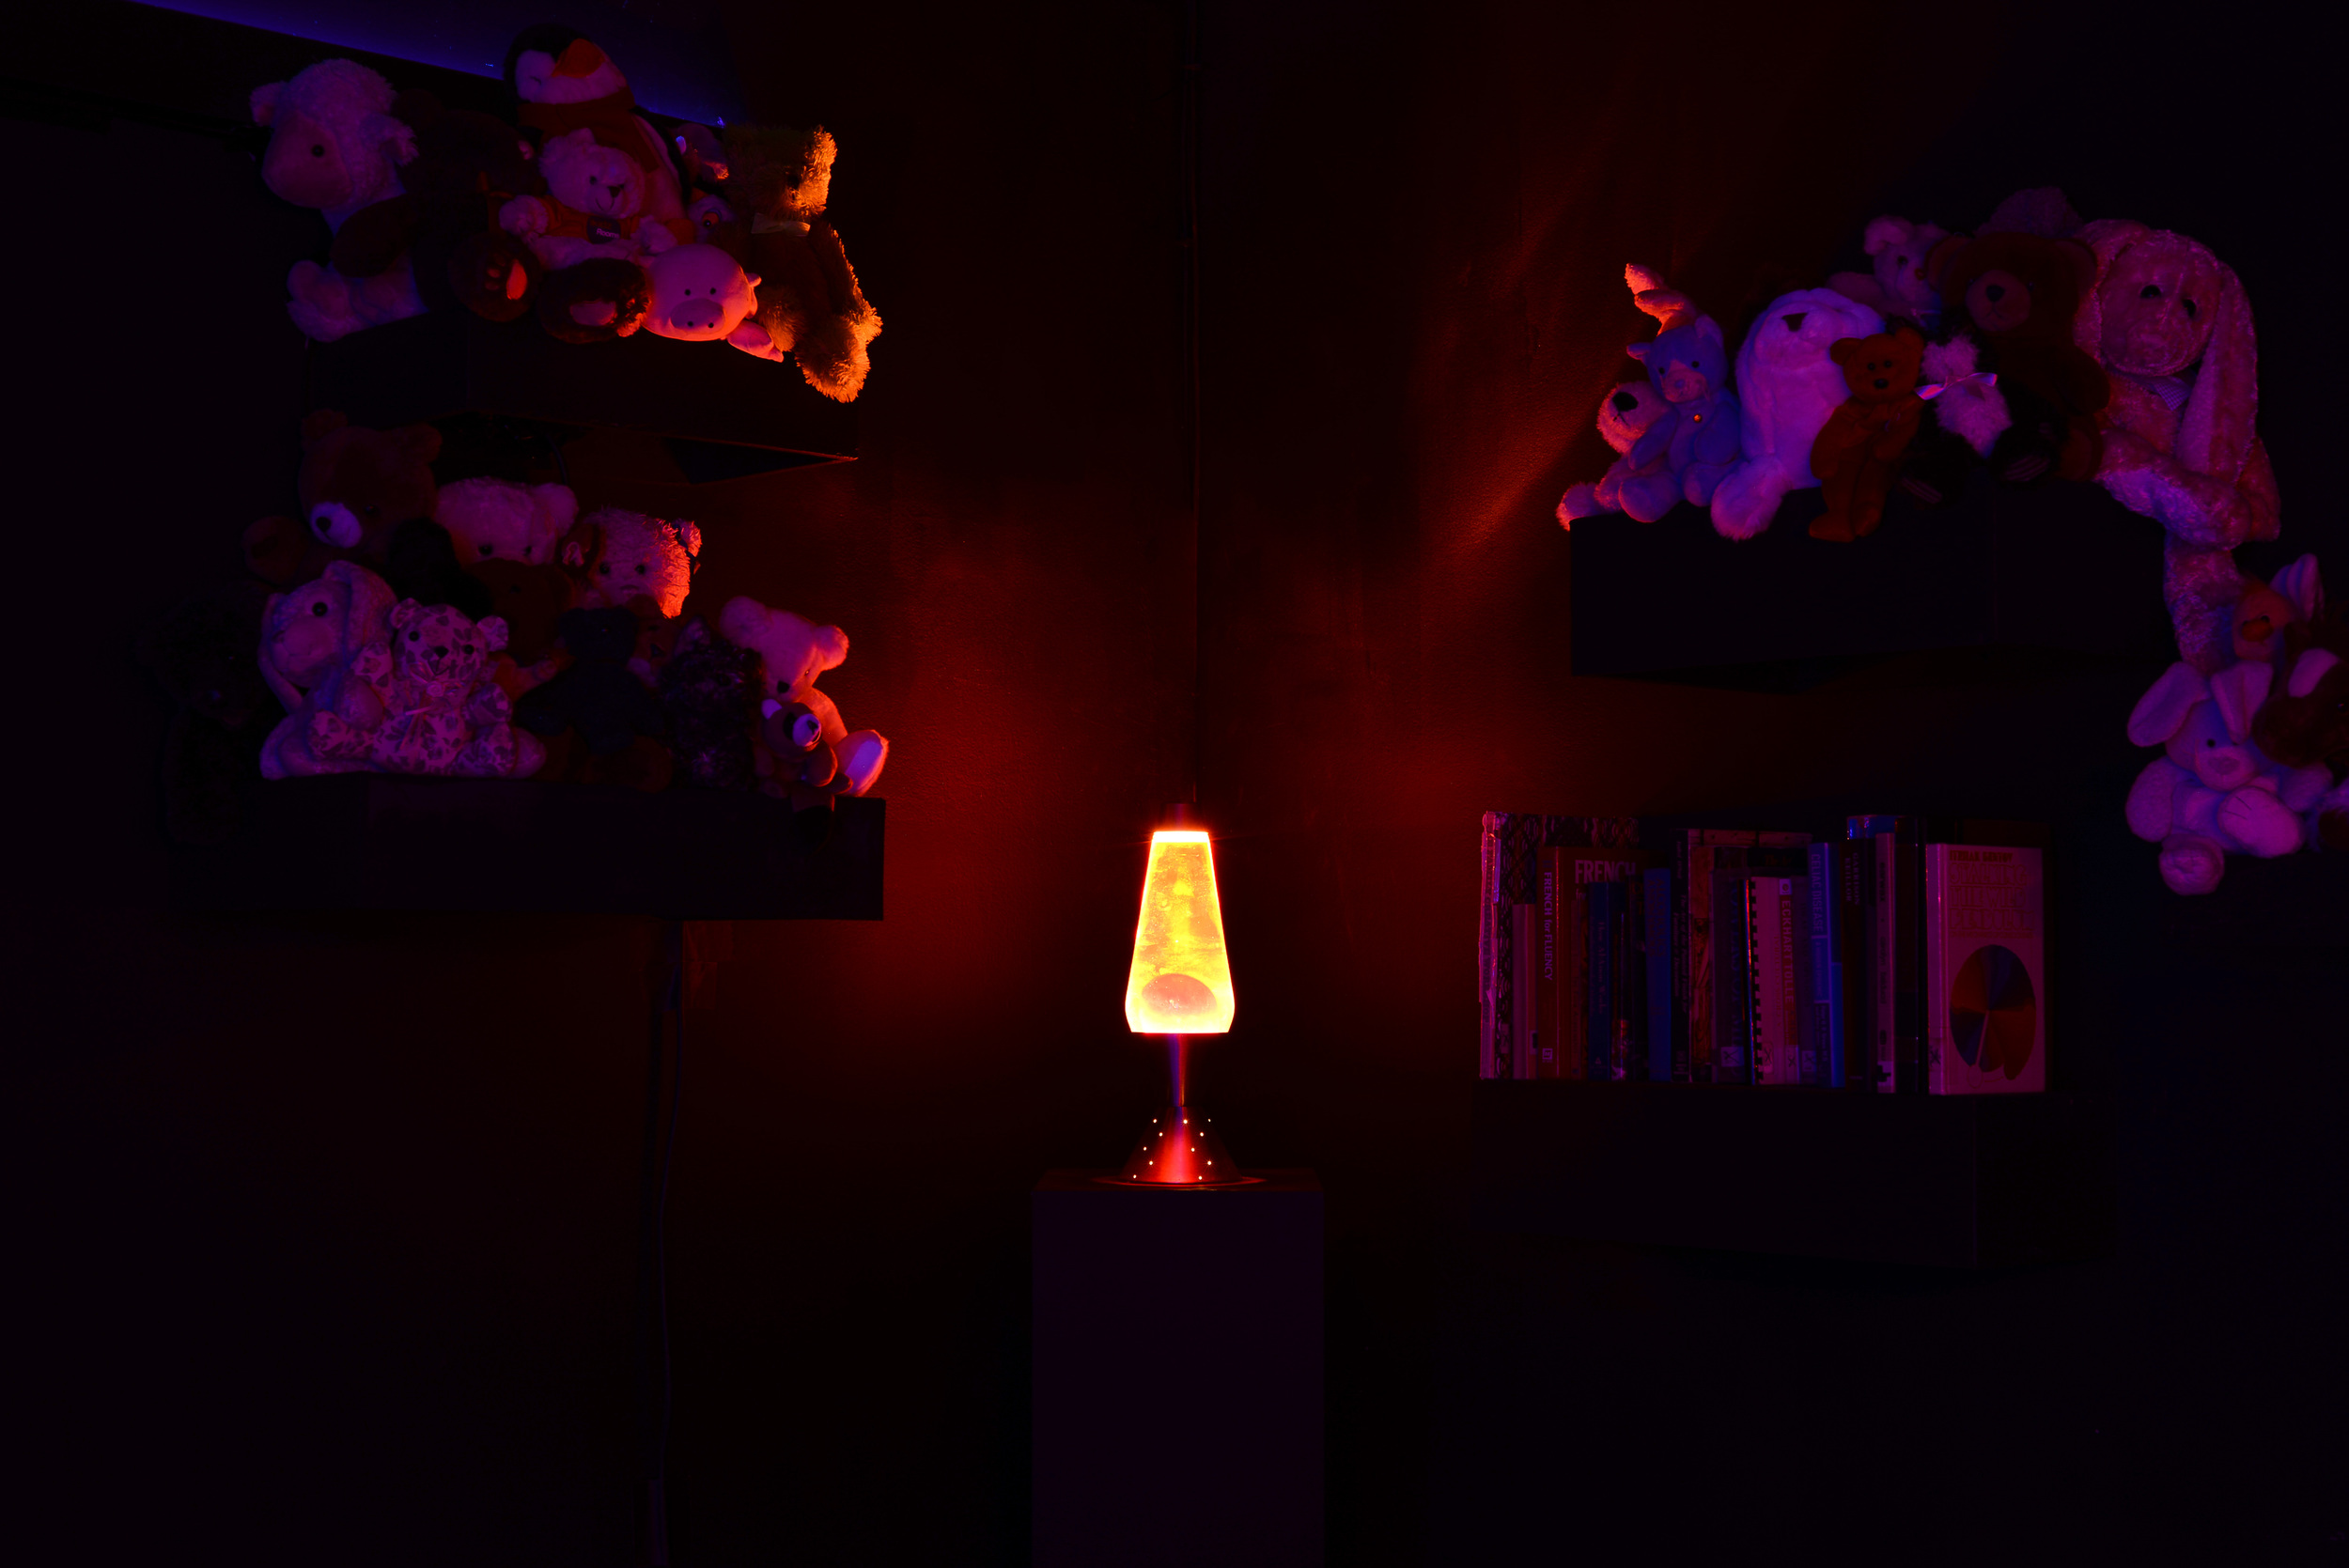 Dark-Rooms-Books-and-Lava-Lamp.jpg